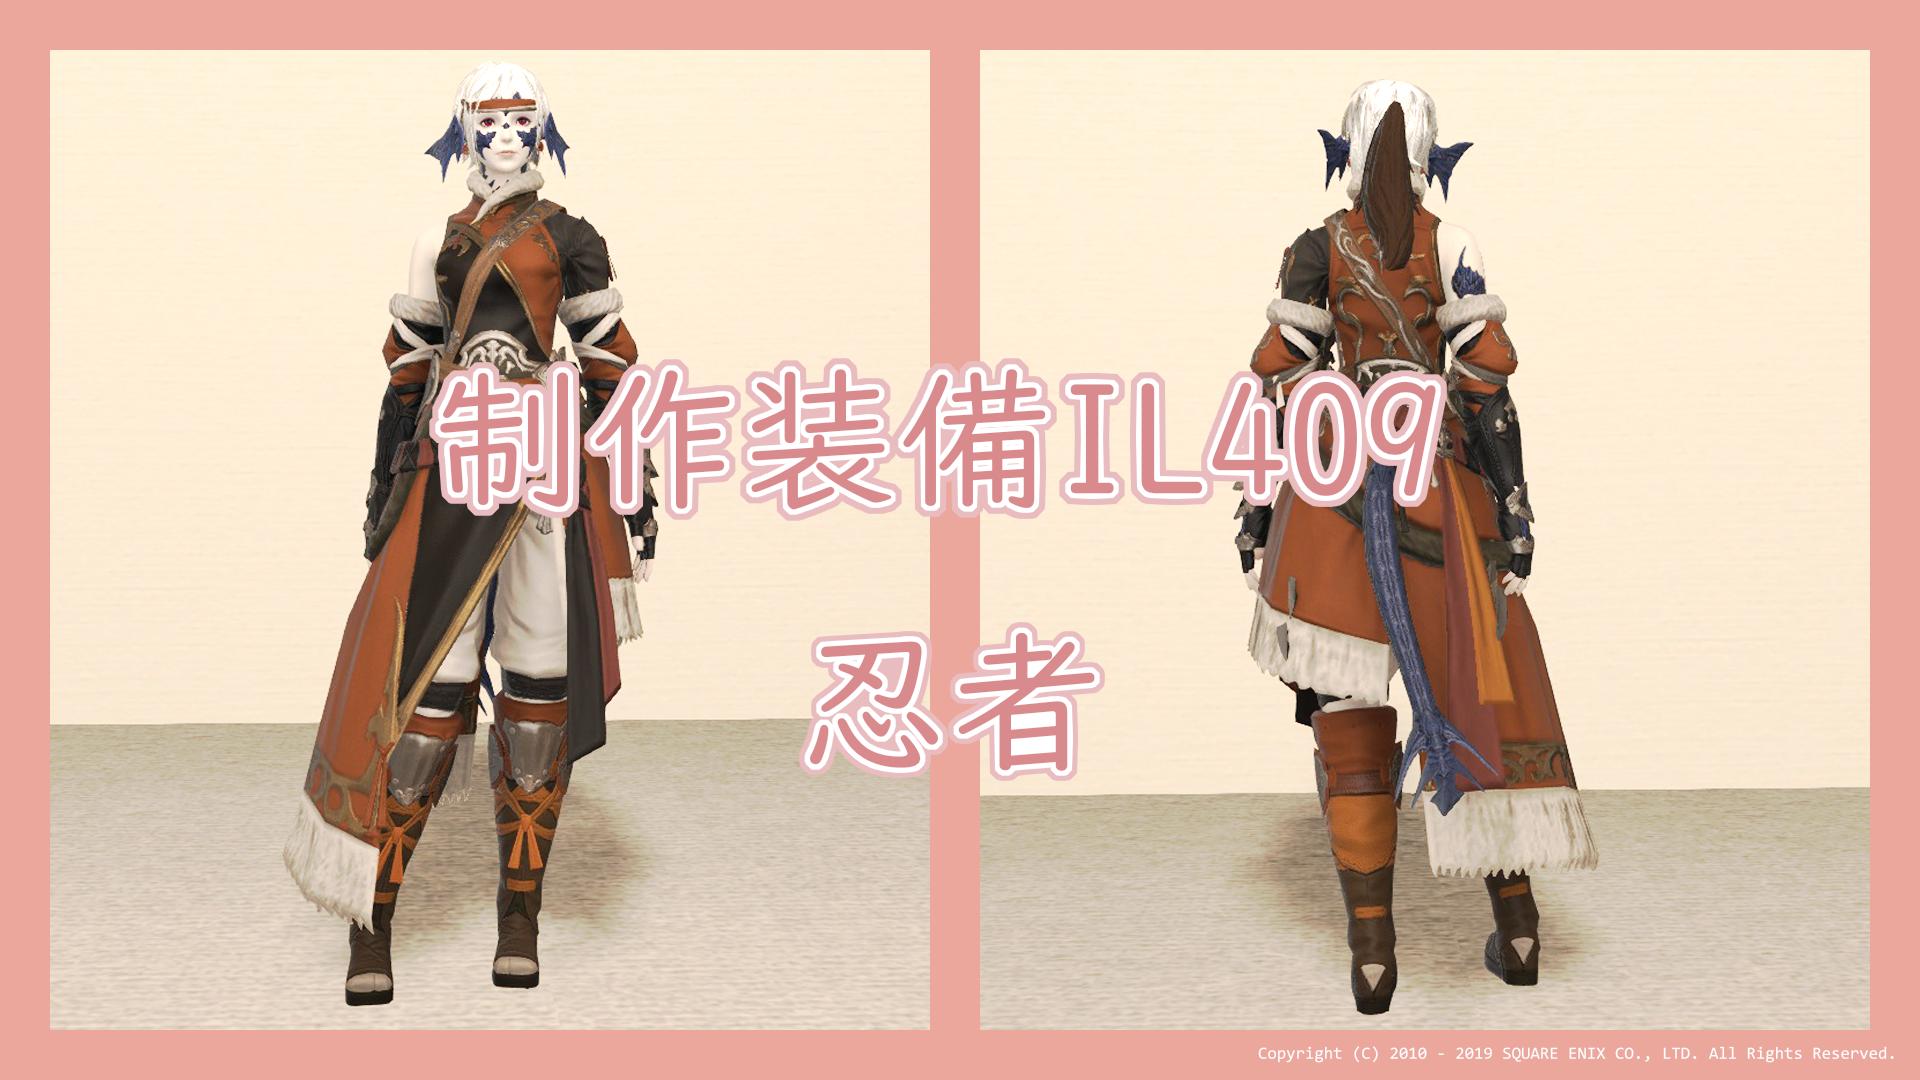 【FF14】 制作装備IL409【忍】